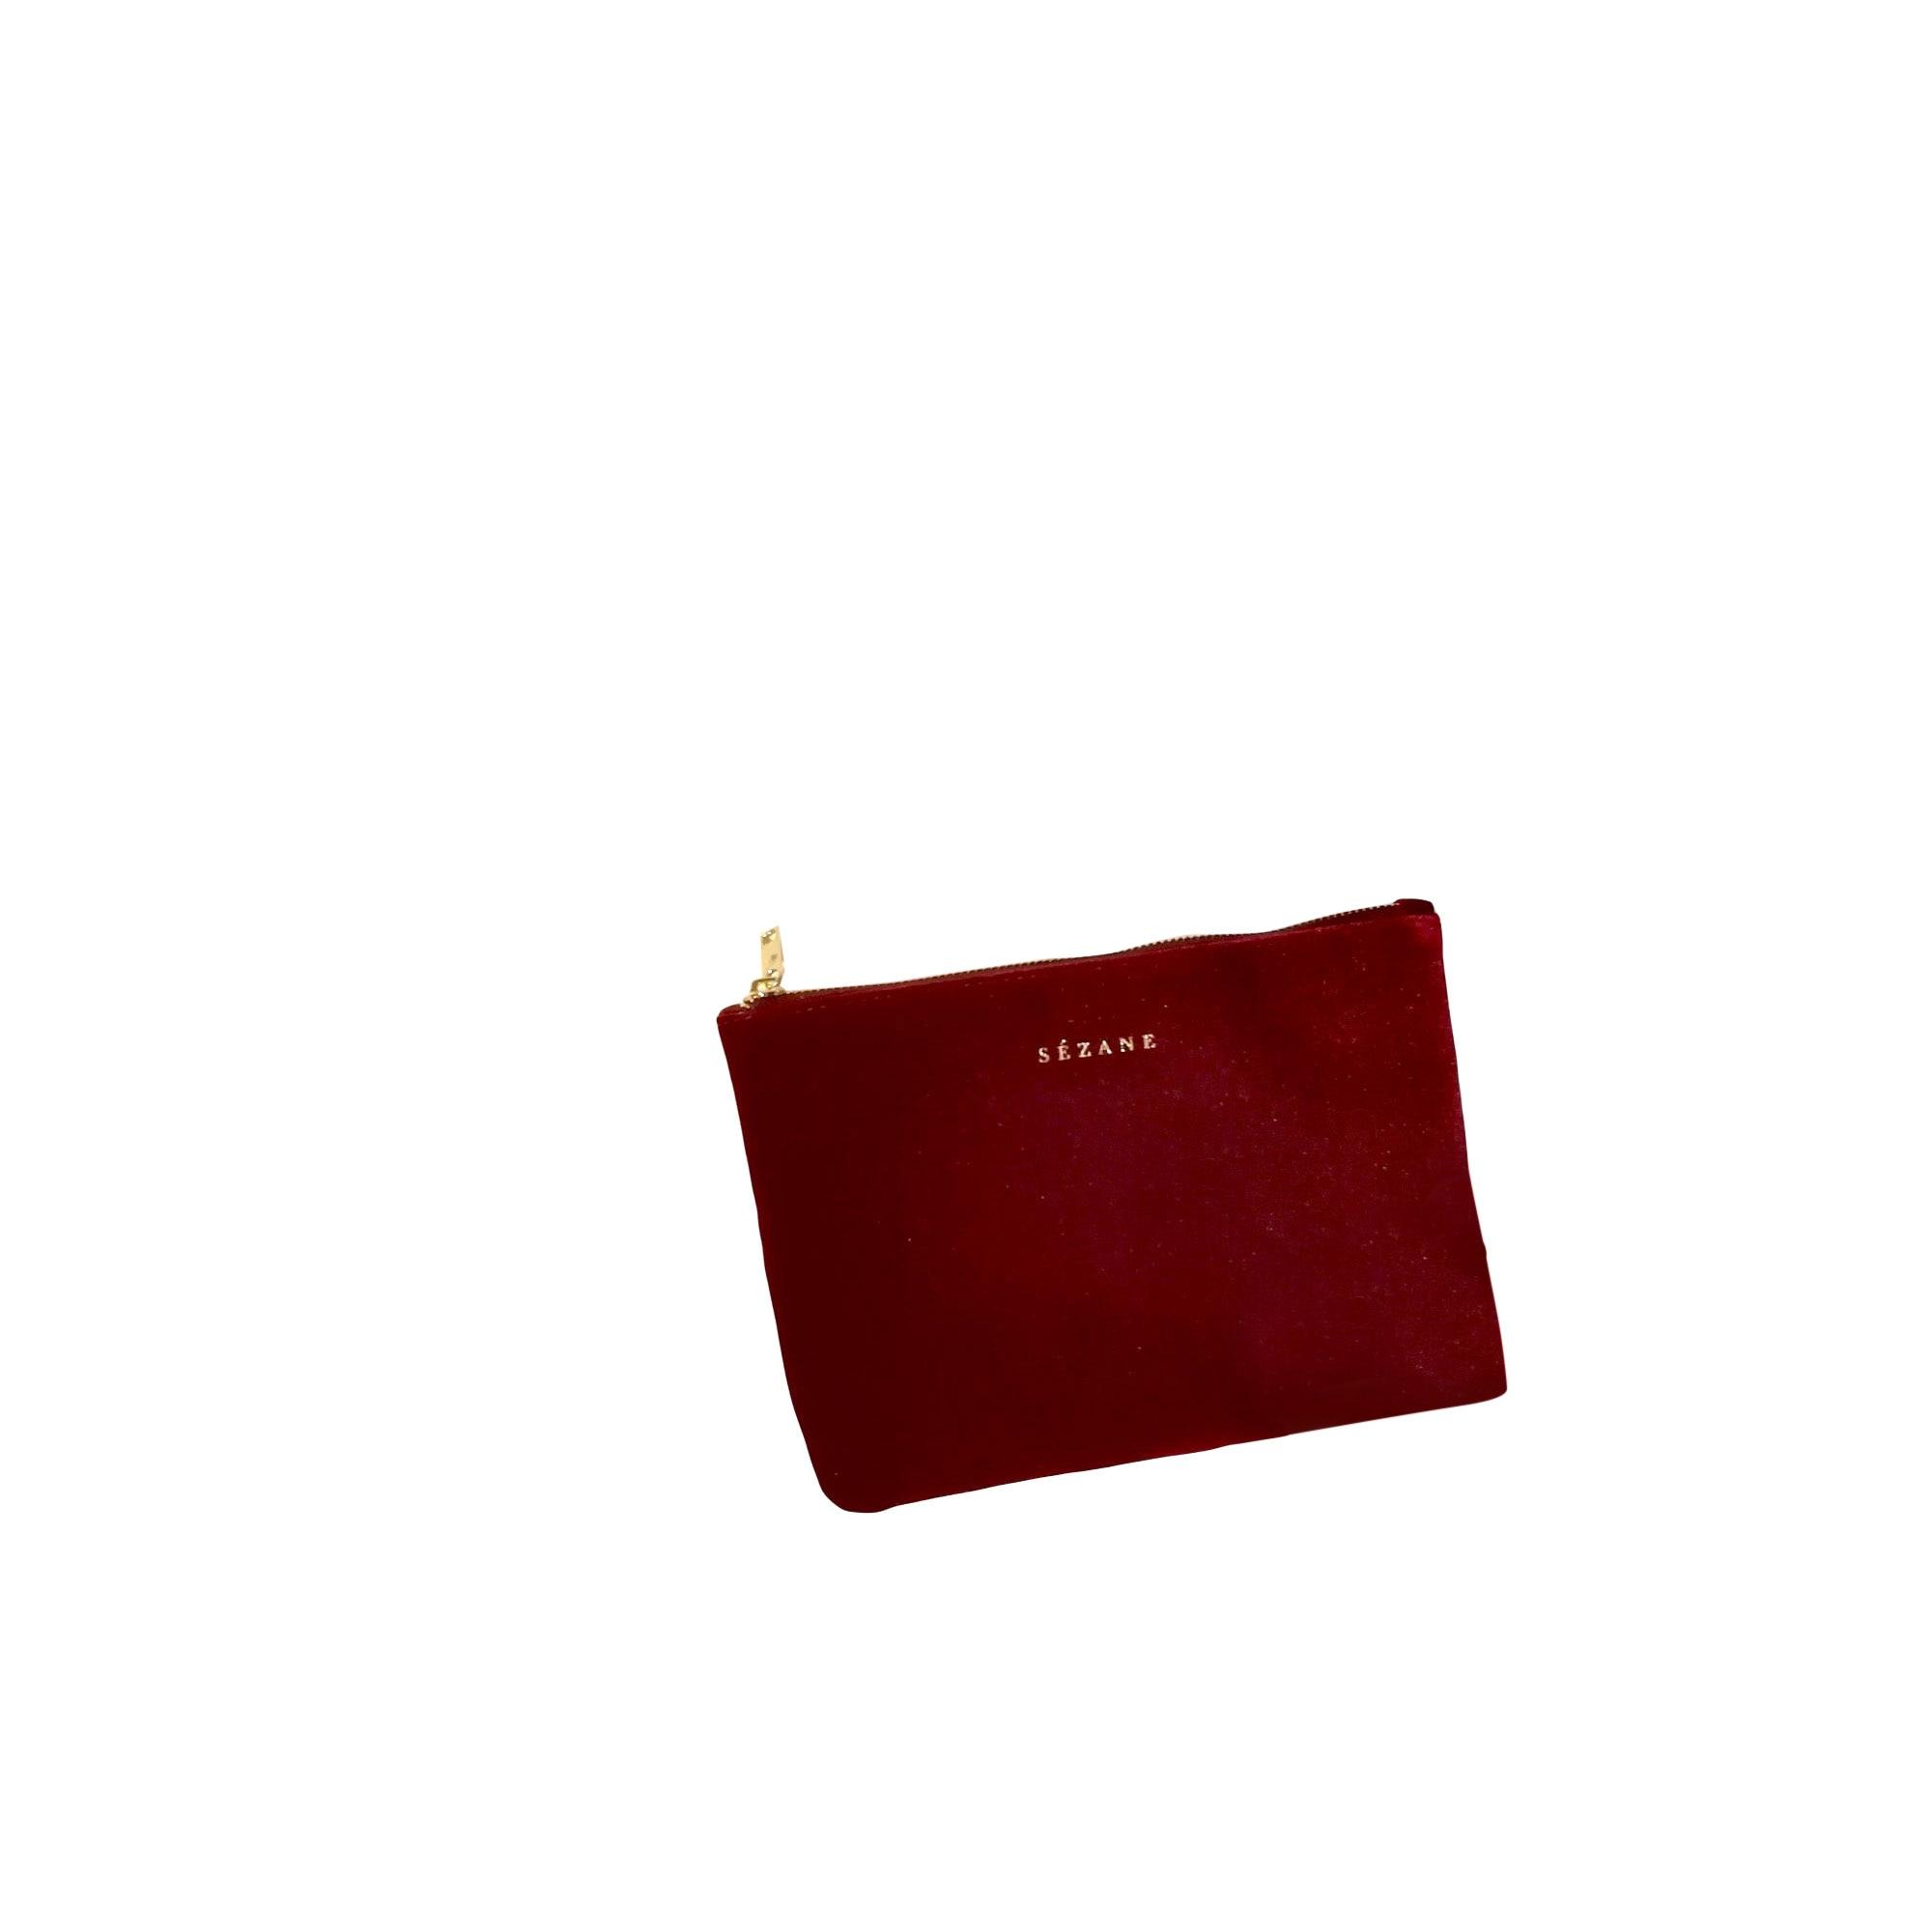 Sac pochette en tissu SÉZANE velours rouge